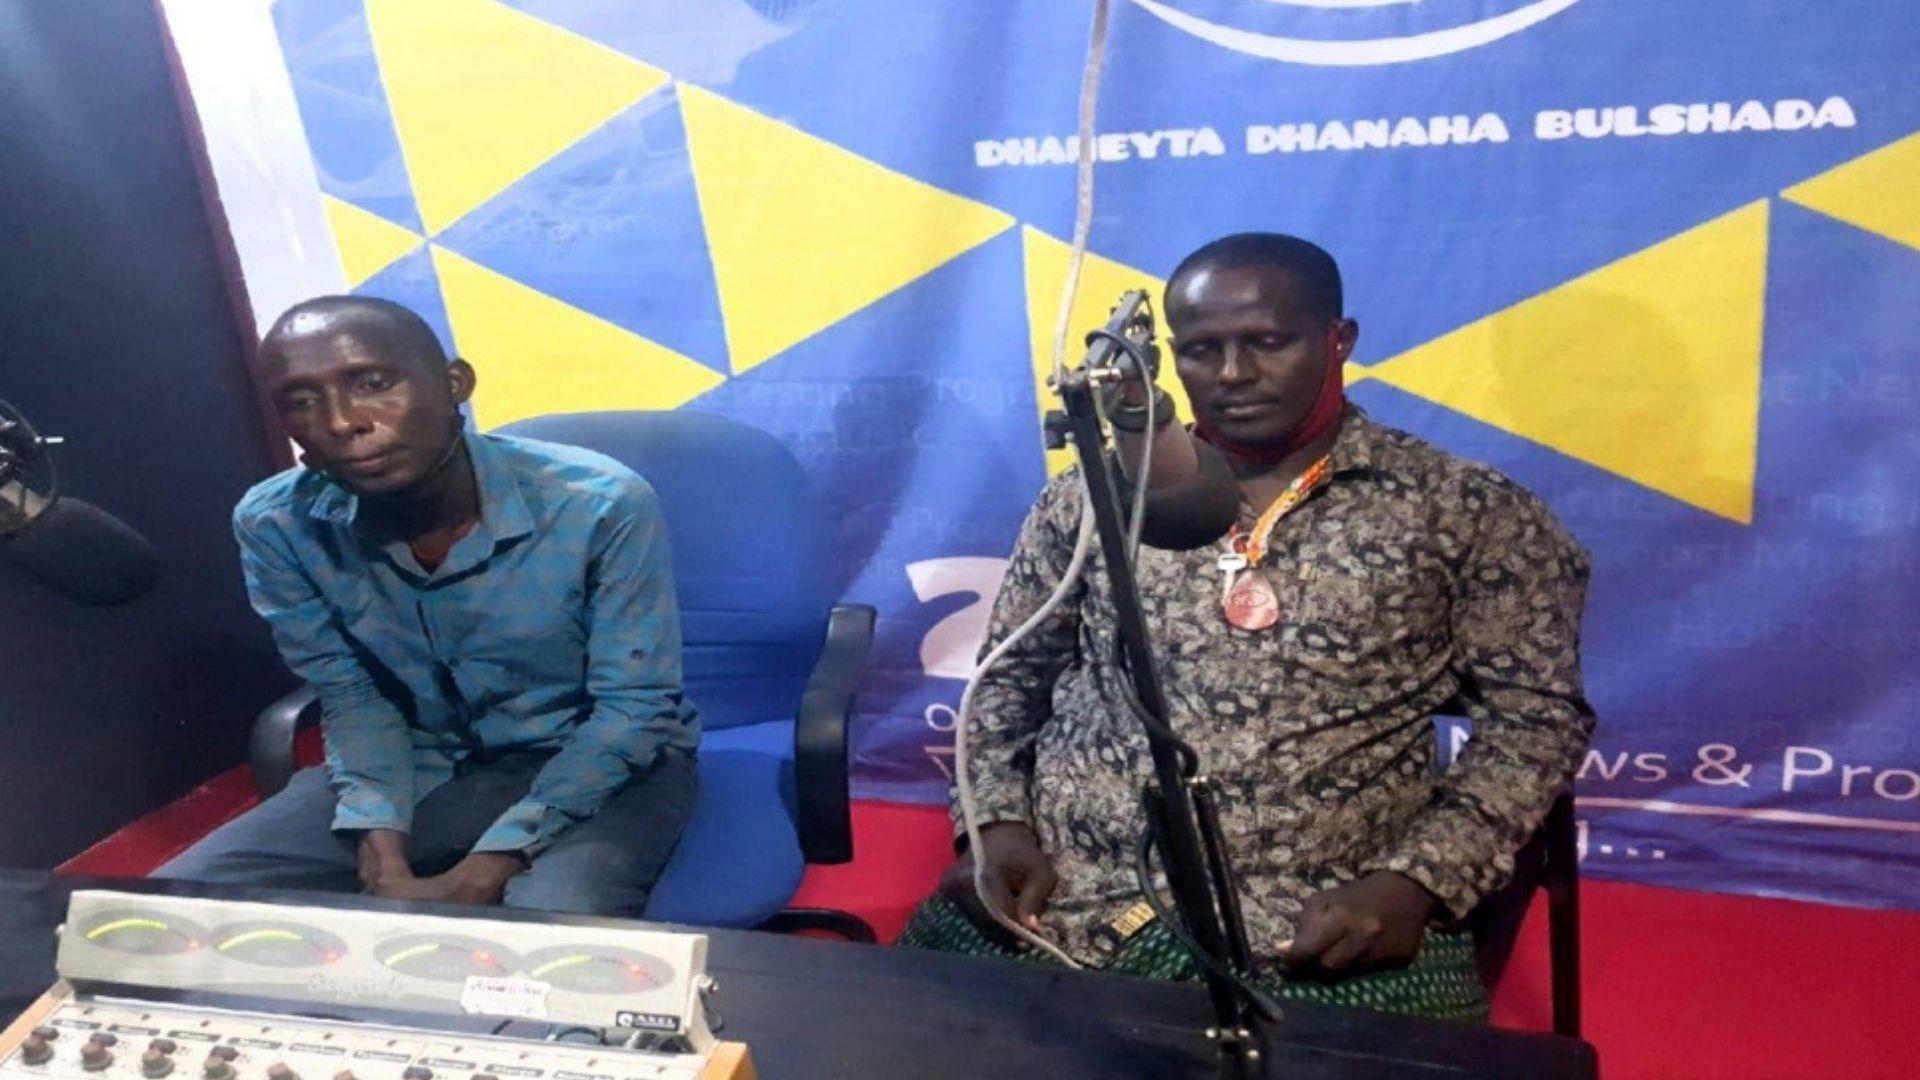 Fathers fight against FGM on Radio in Wajir County, Kenya